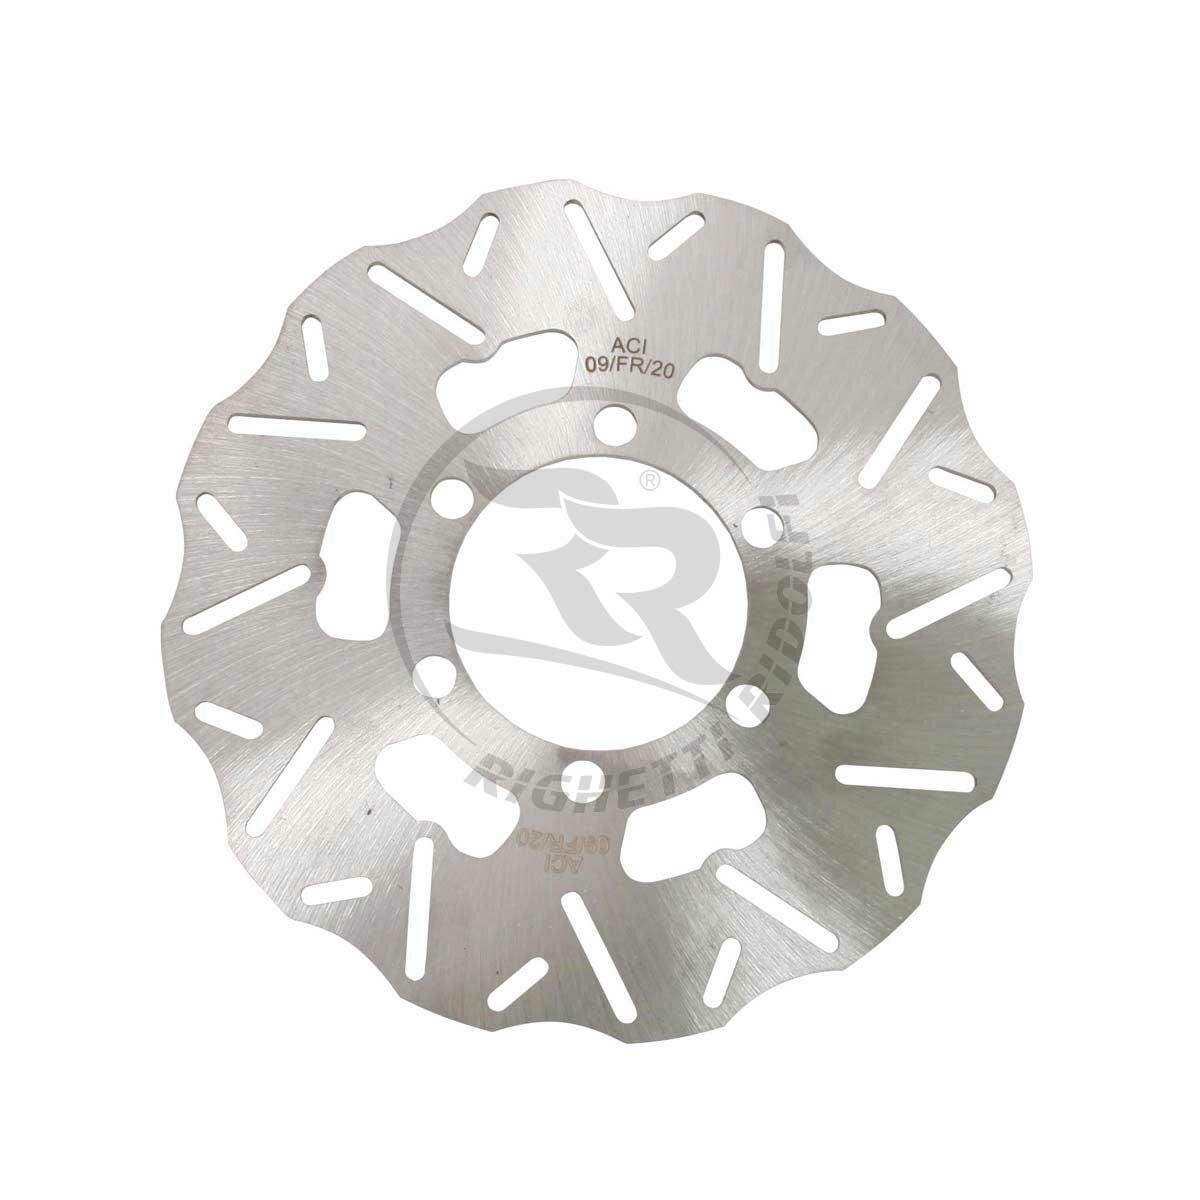 Rear Brake Disc Floating Inox D 170mm Thickness 3 5mm   Righetti e